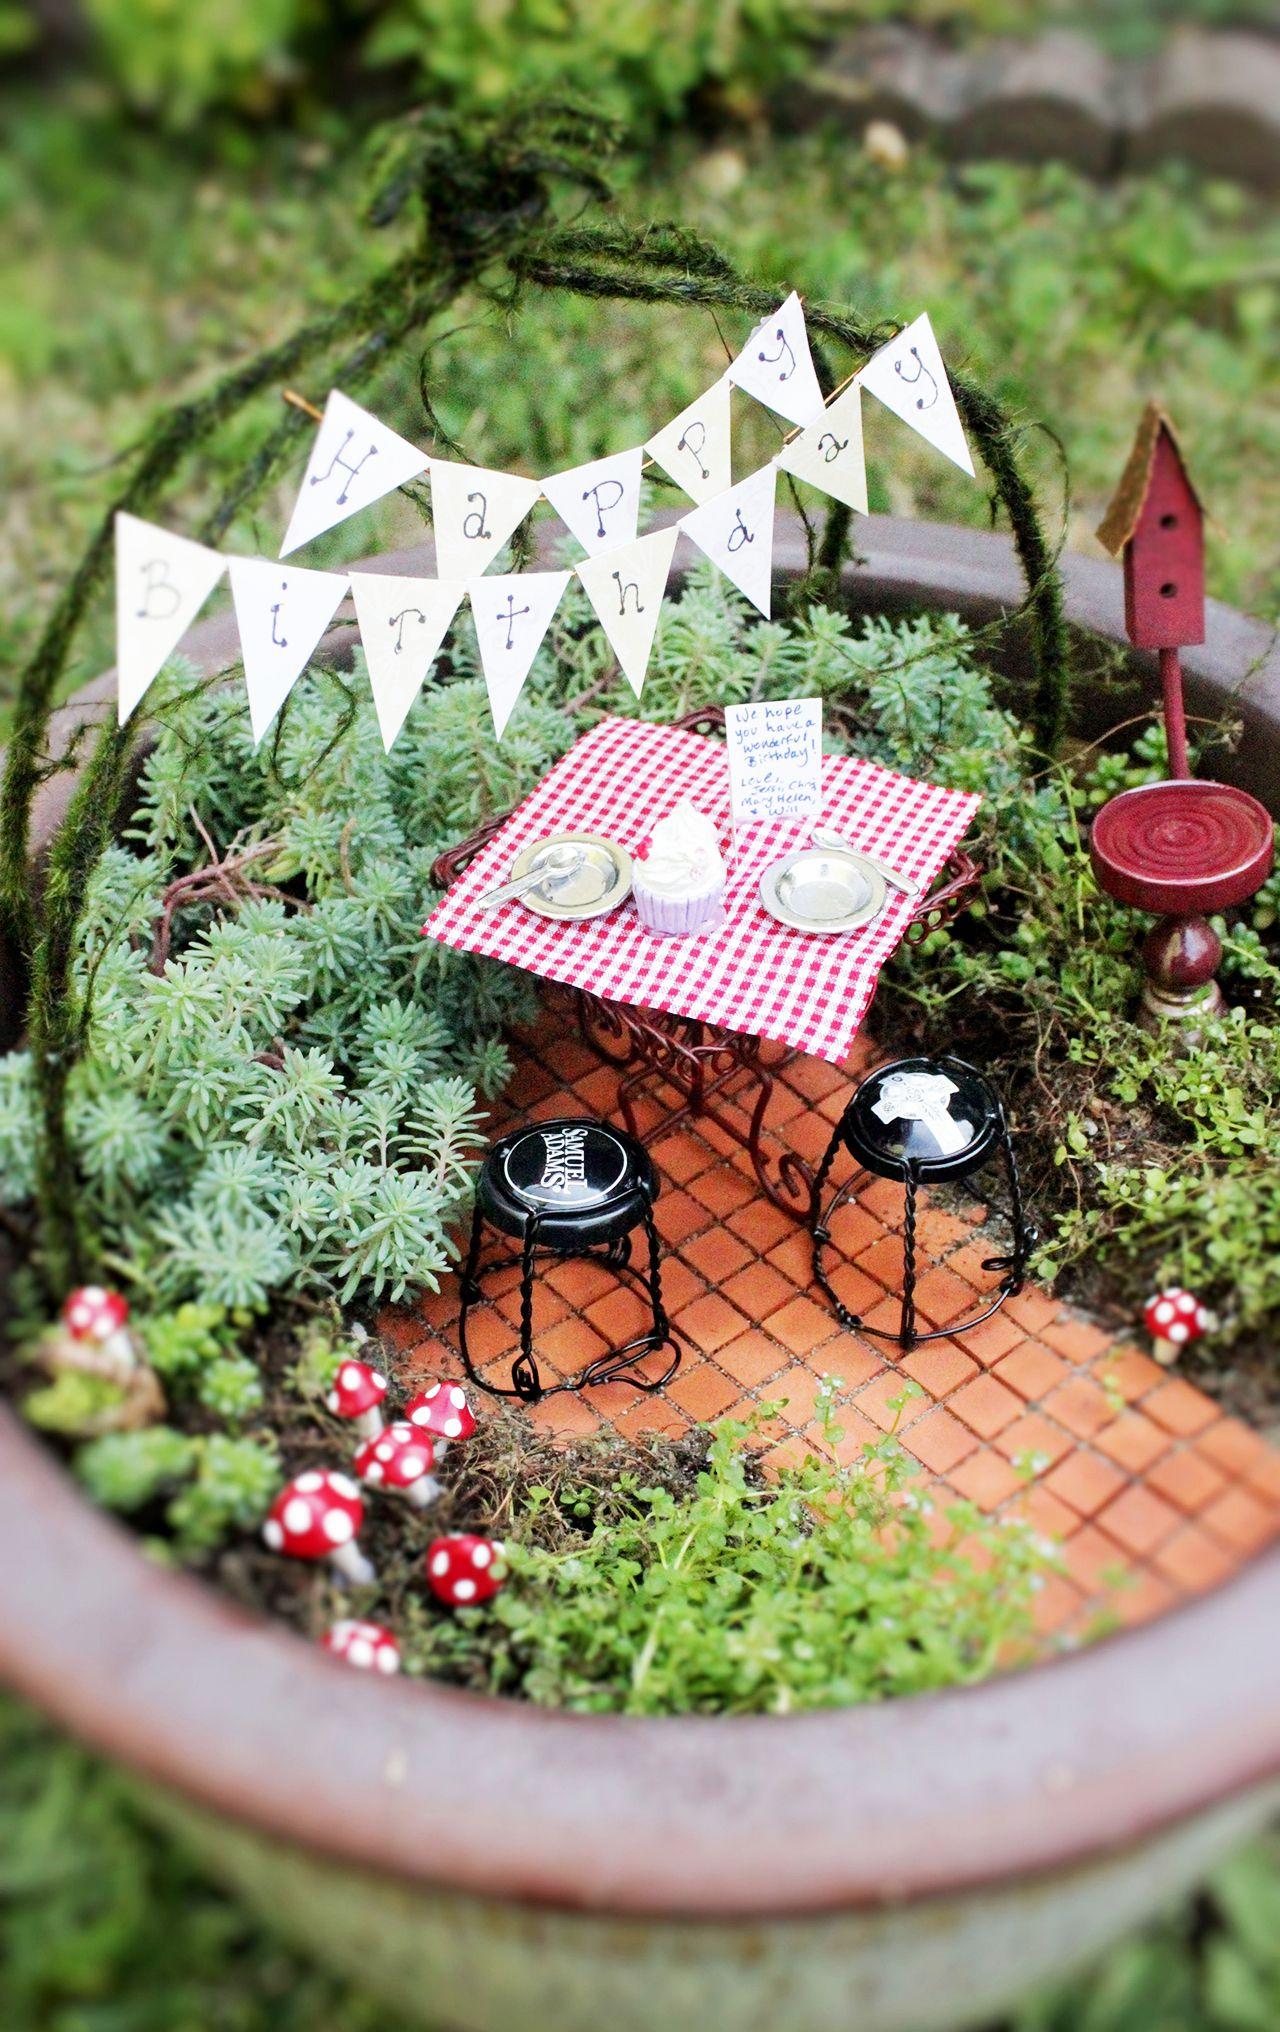 garden decor | { Faerie Magic } | Pinterest | Gardens and Plants